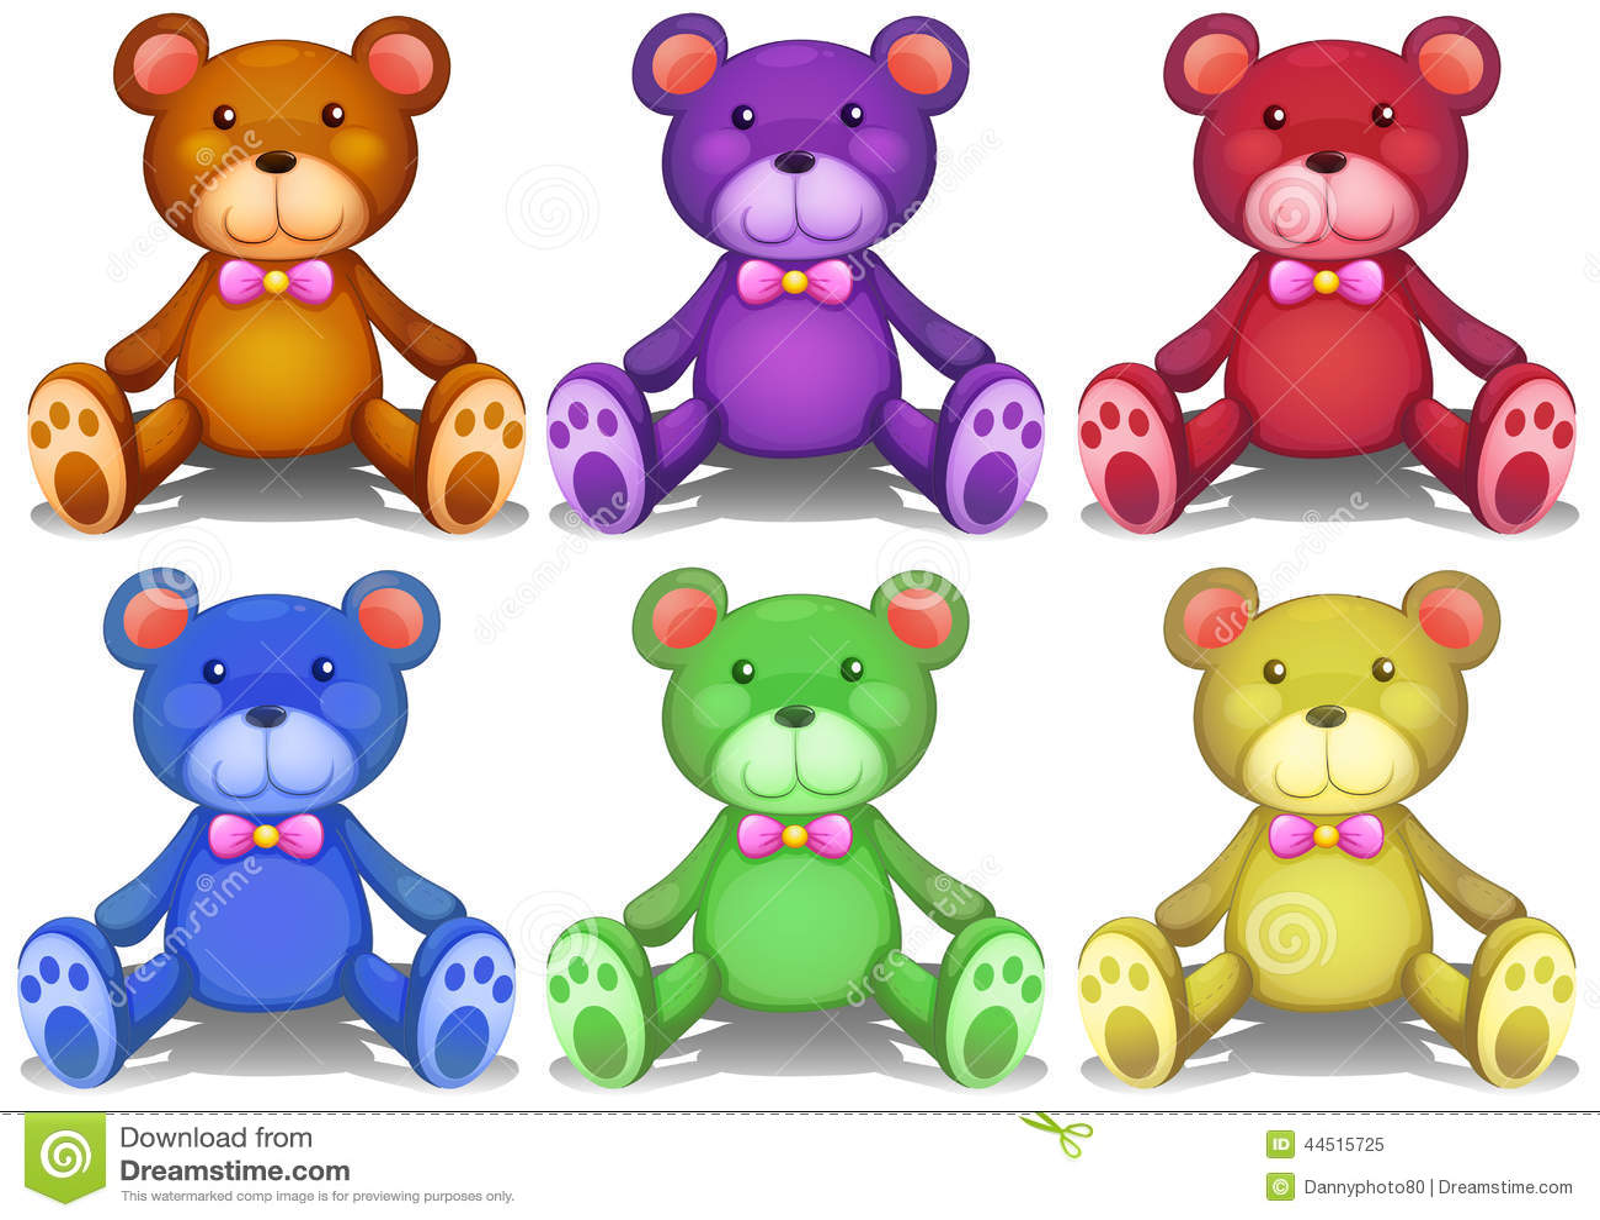 Colorful Teddy Bears Stock Vector Illustration Of Stuff